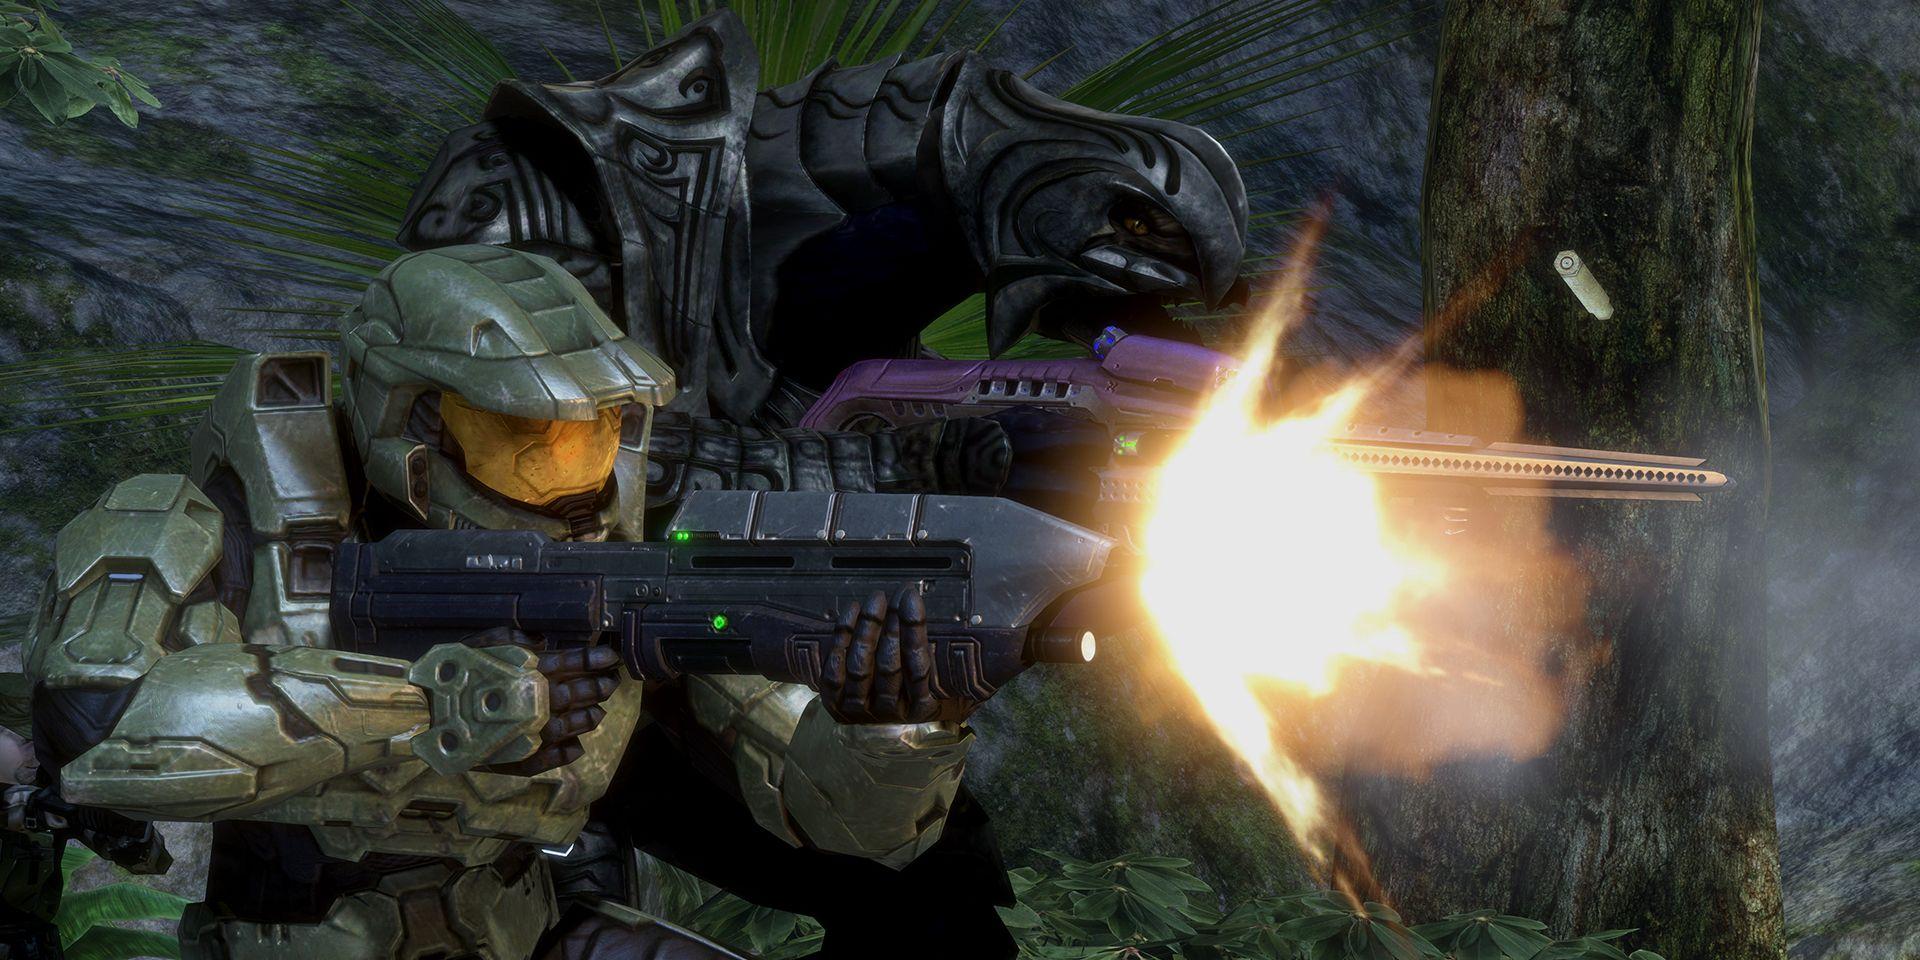 Best Video Game Sequels for Next-Gen Consoles